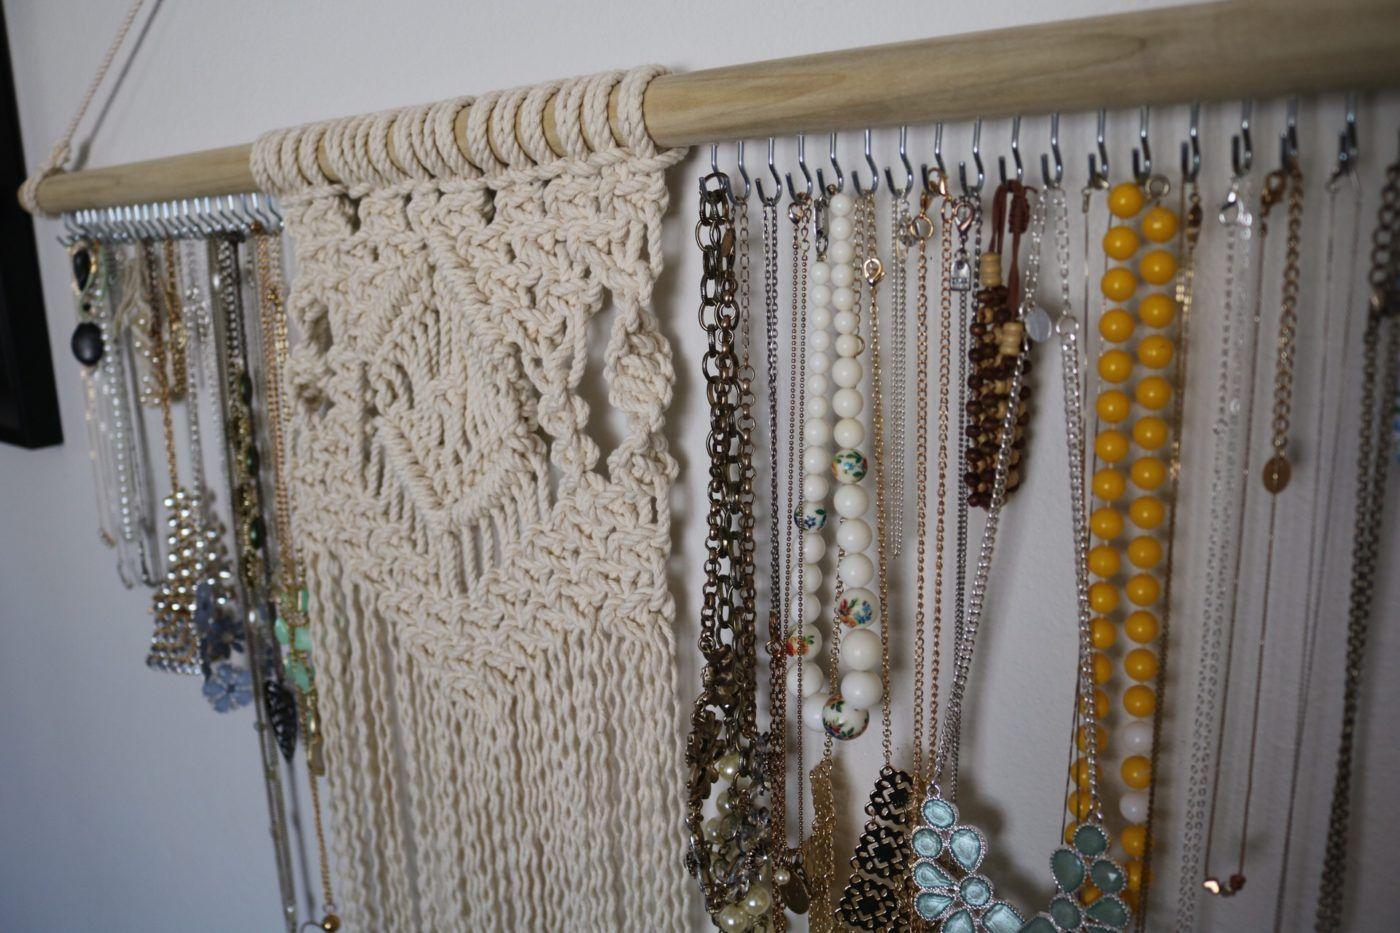 Macrame Jewelry Organizer Wall Hanging Reform Fibers Necklace Holder Jewelry Organizer Wall Jewelry Wall Diy Jewelry Holder